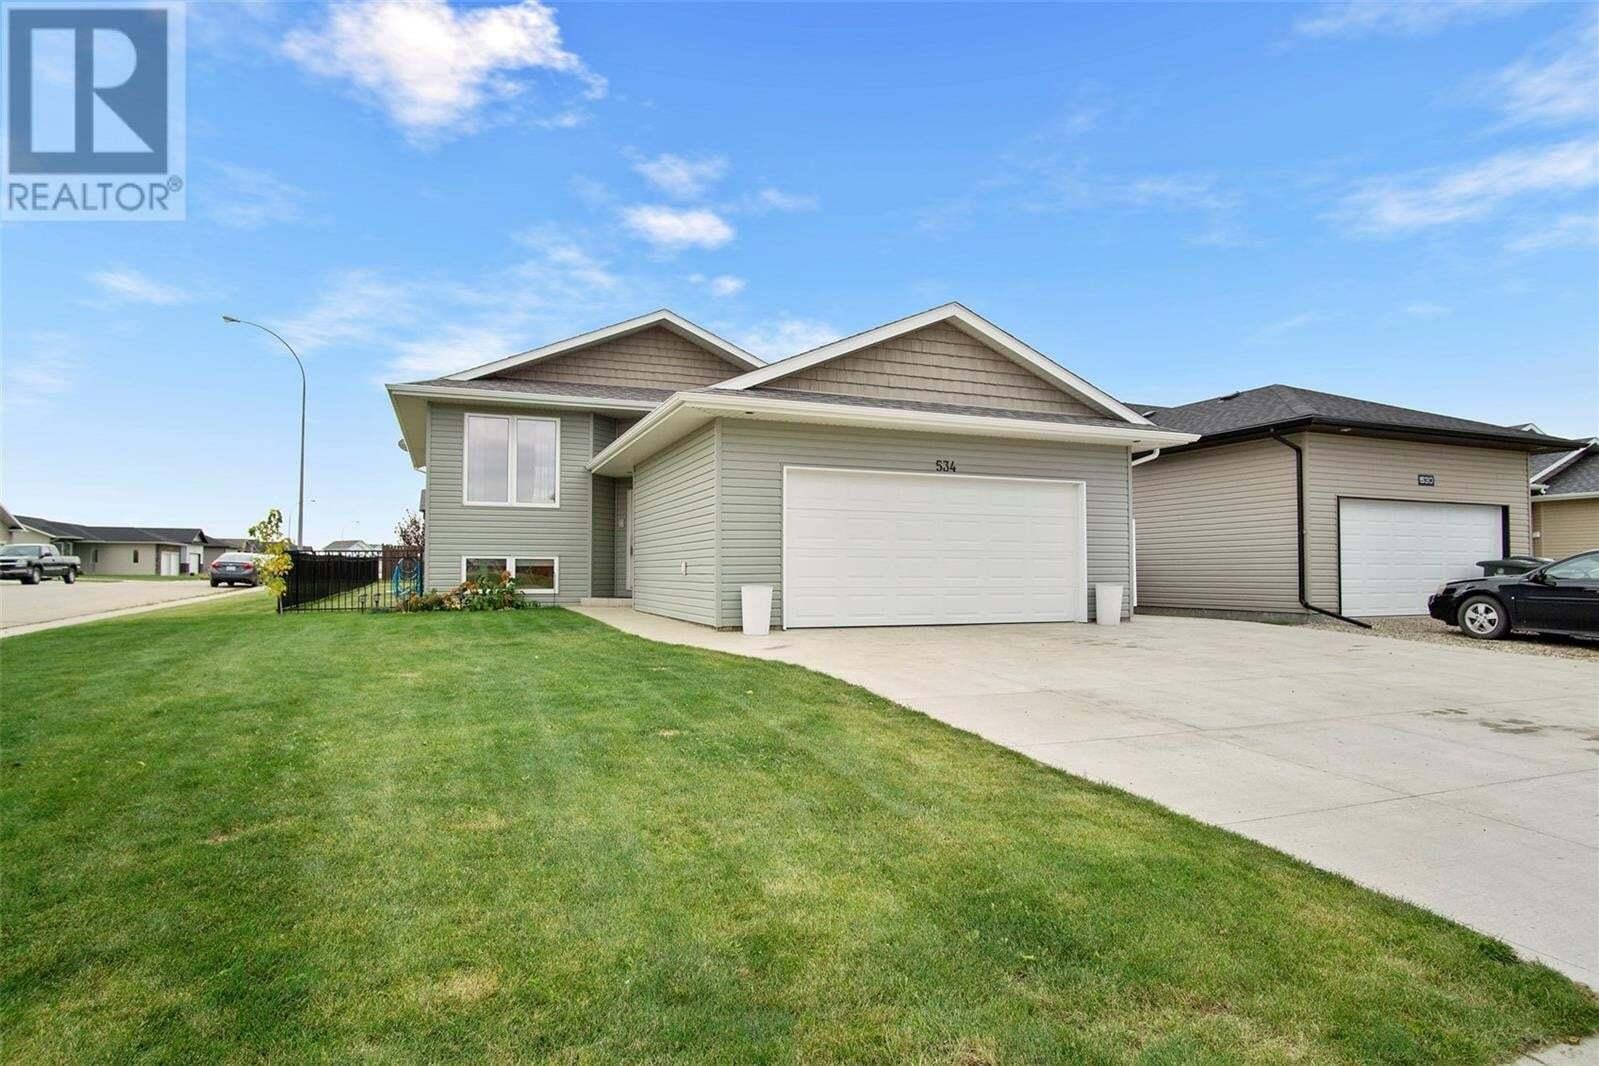 House for sale at 534 2nd St E Langham Saskatchewan - MLS: SK827878